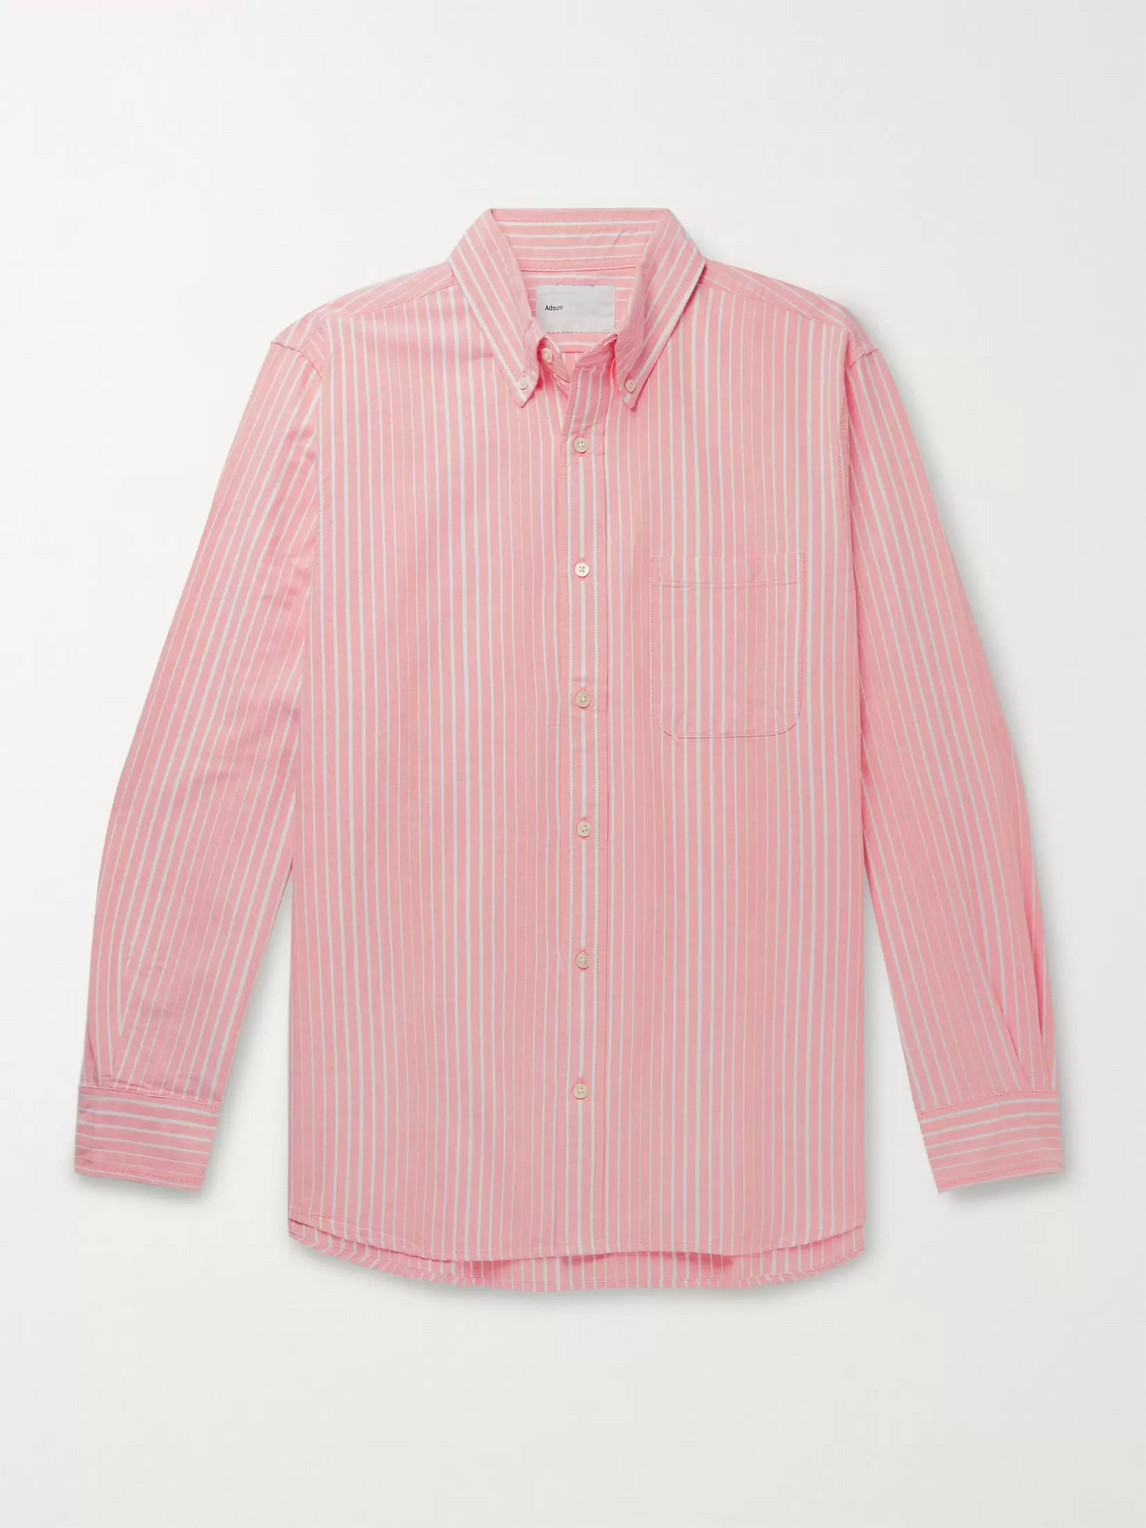 Adsum Button-down Collar Striped Cotton Oxford Shirt In Orange